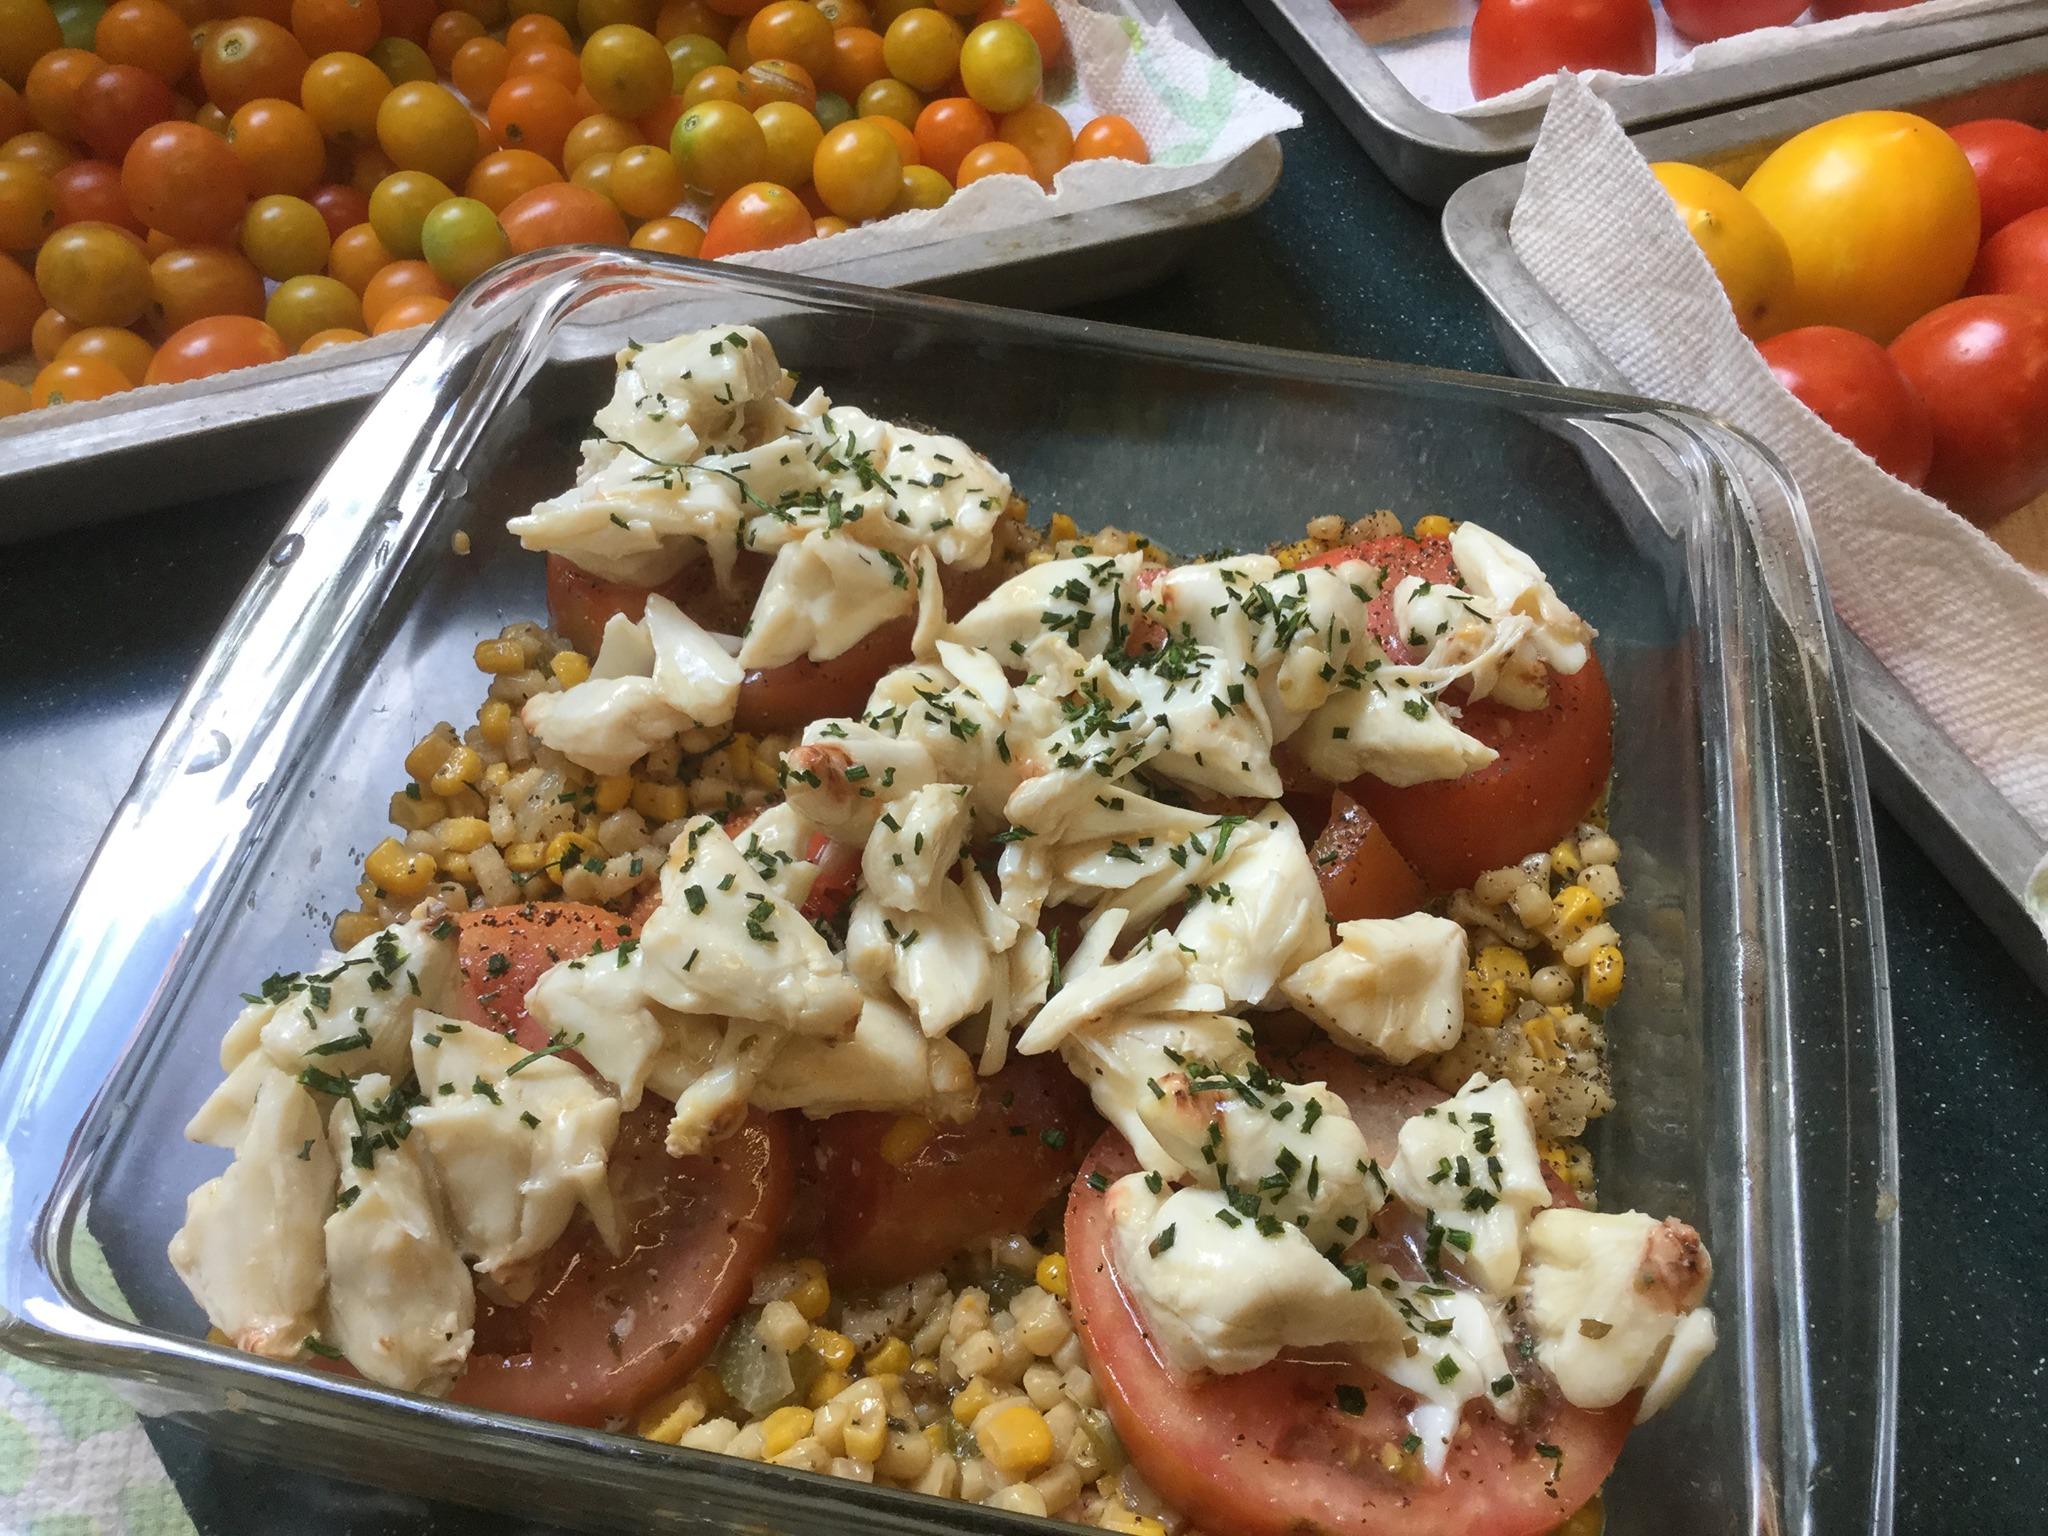 Jumbo Lump Crabmeat Topped Fresh Tomatoes Over Corn Casserole